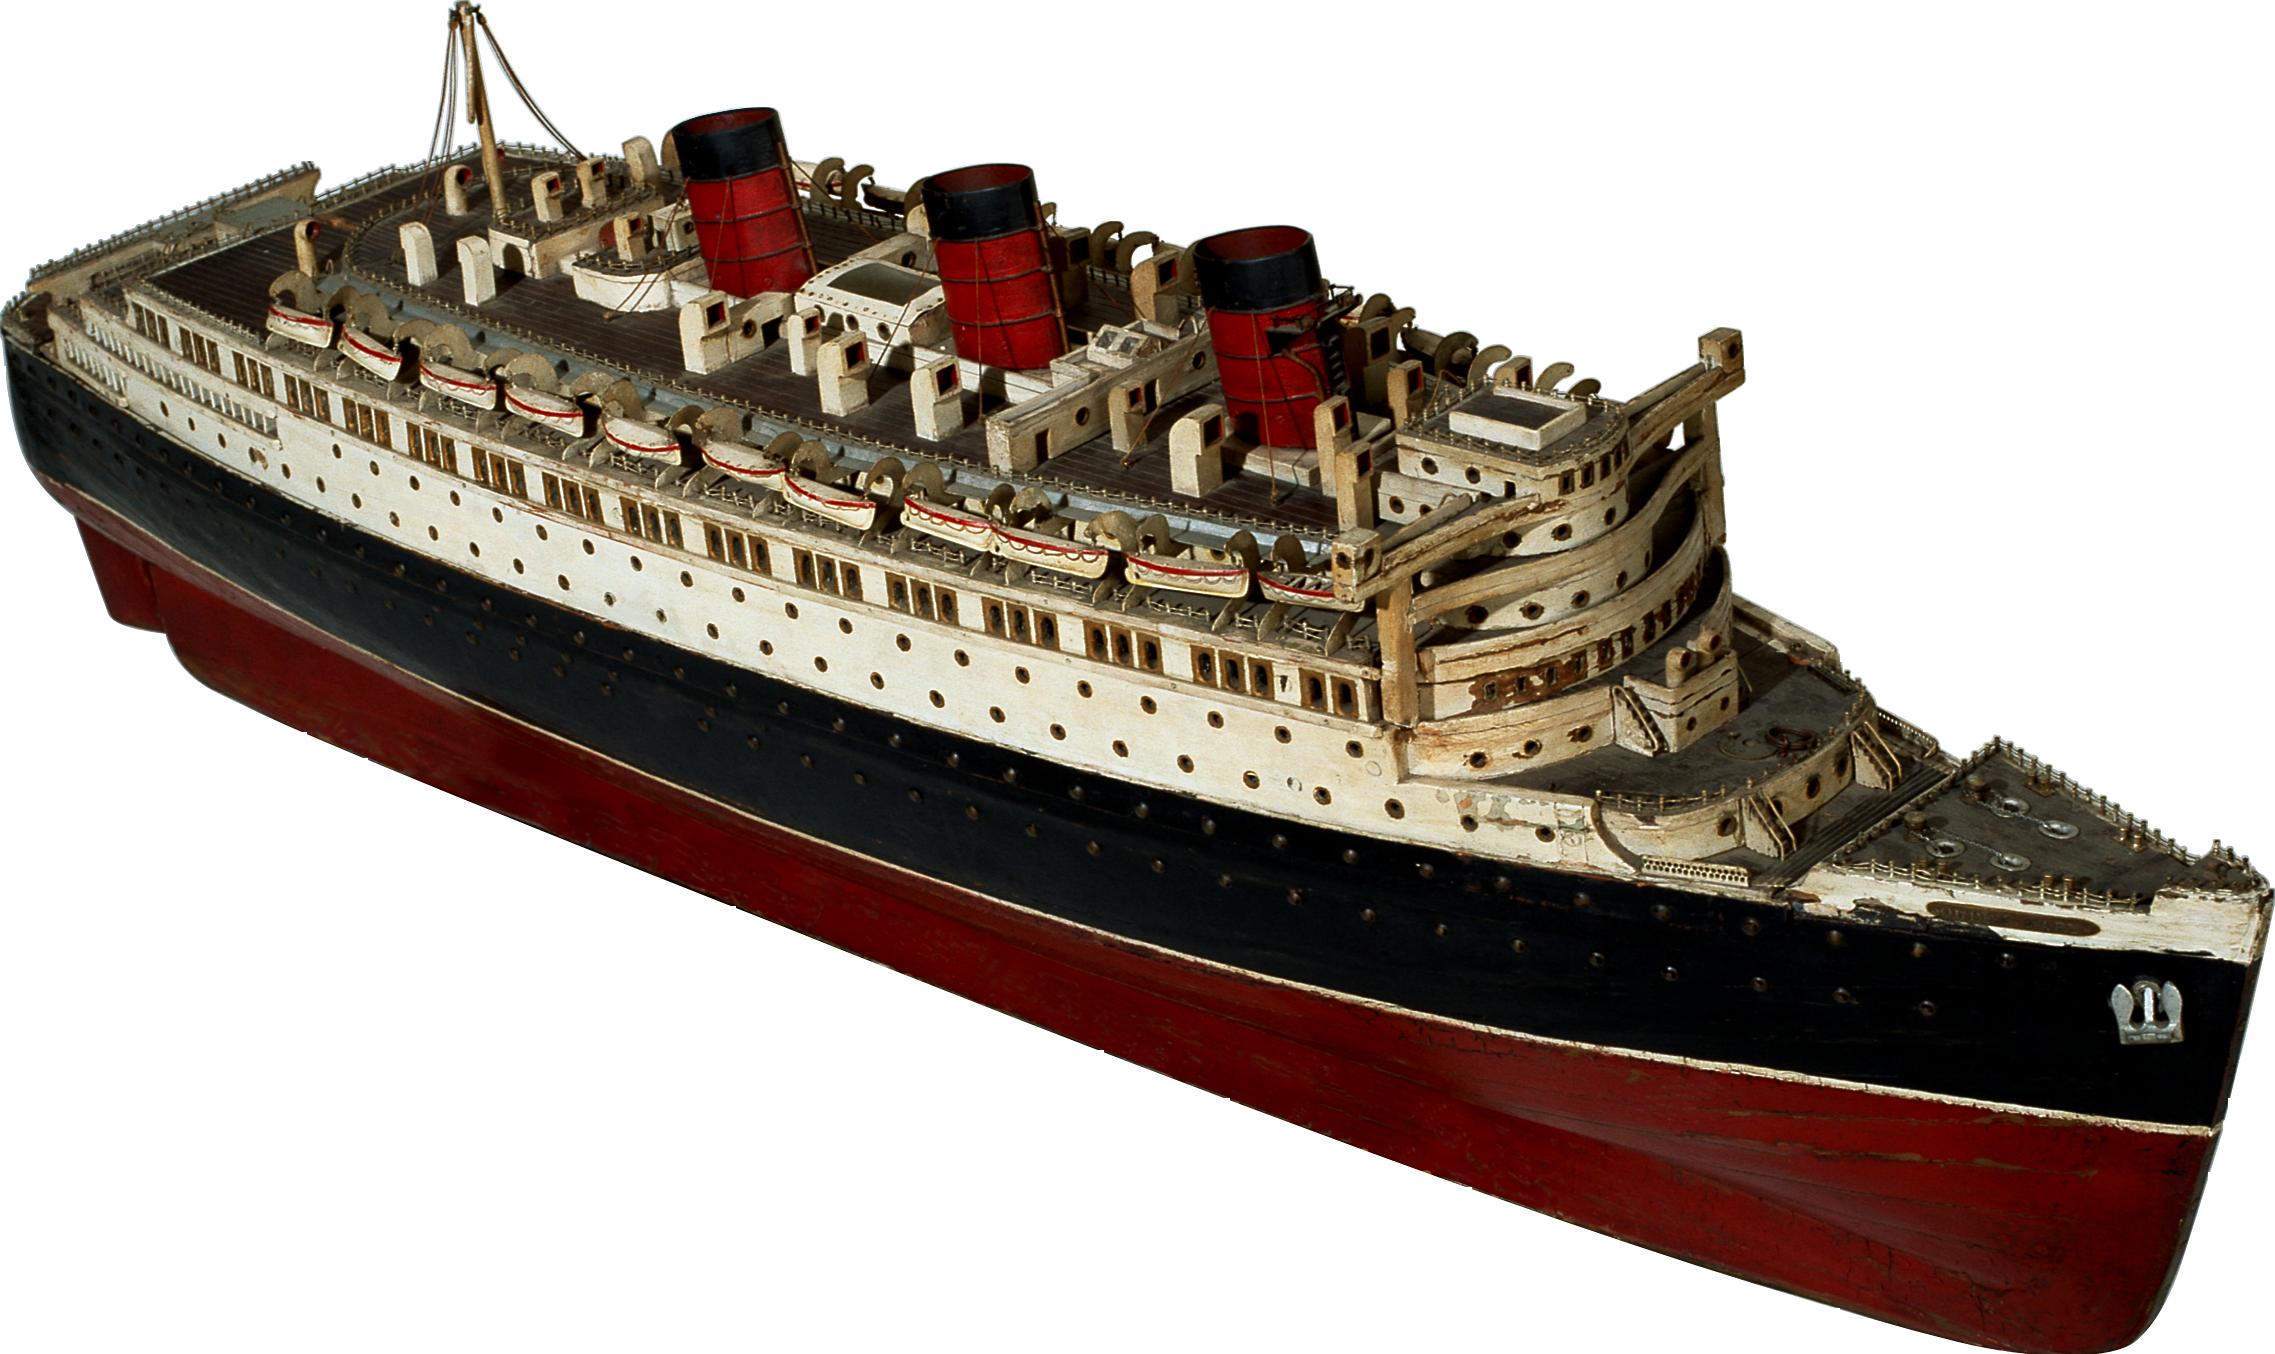 Cruise clipart sea ship. Big png image purepng